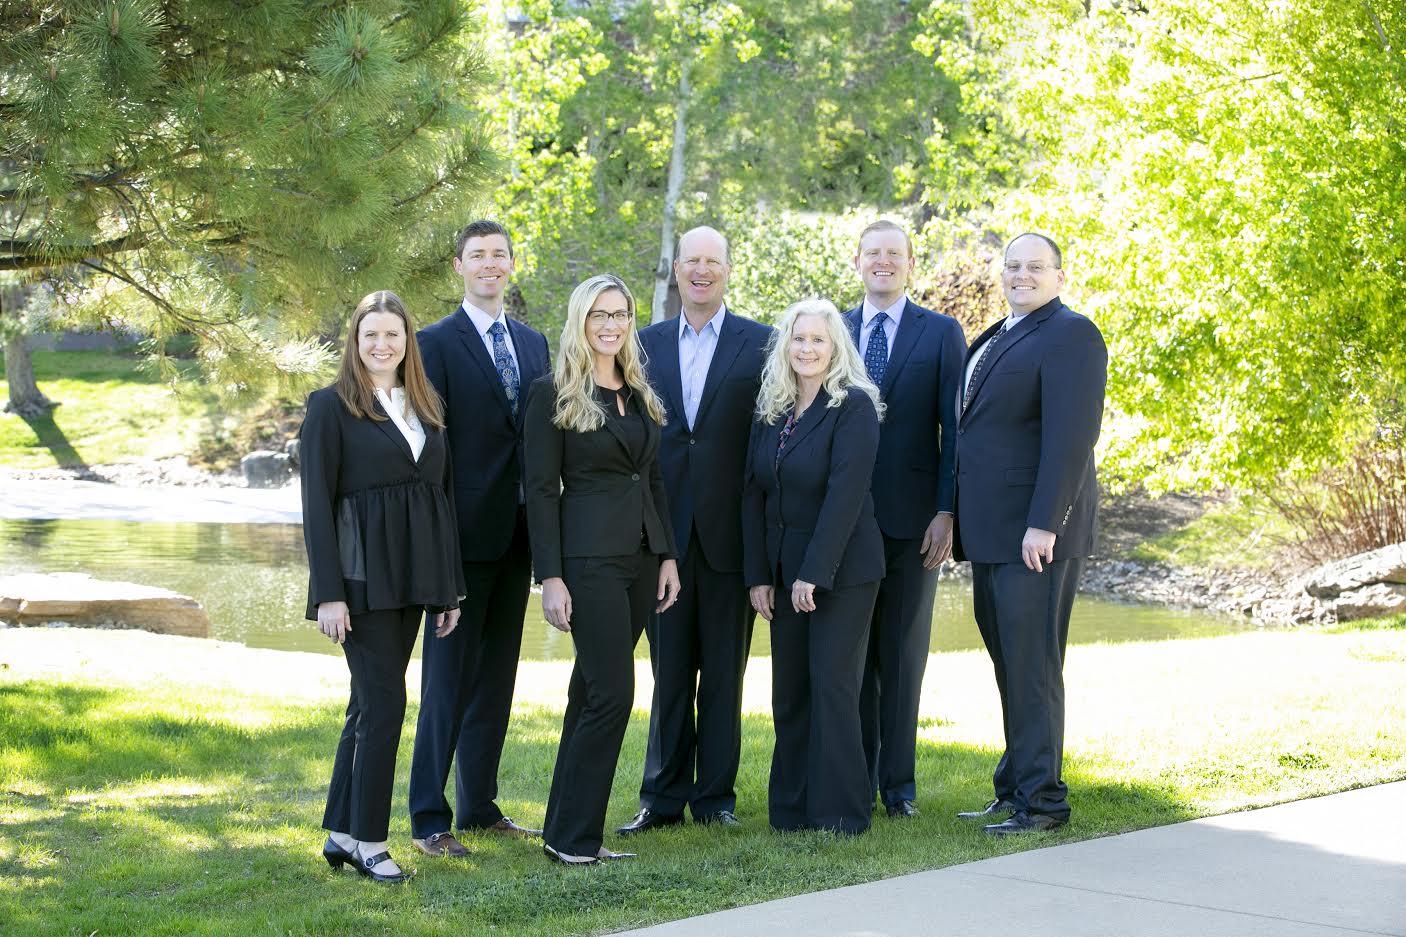 Colorado's Top Rated Local® Financial Advisers Award Winner: Dechtman Wealth Management